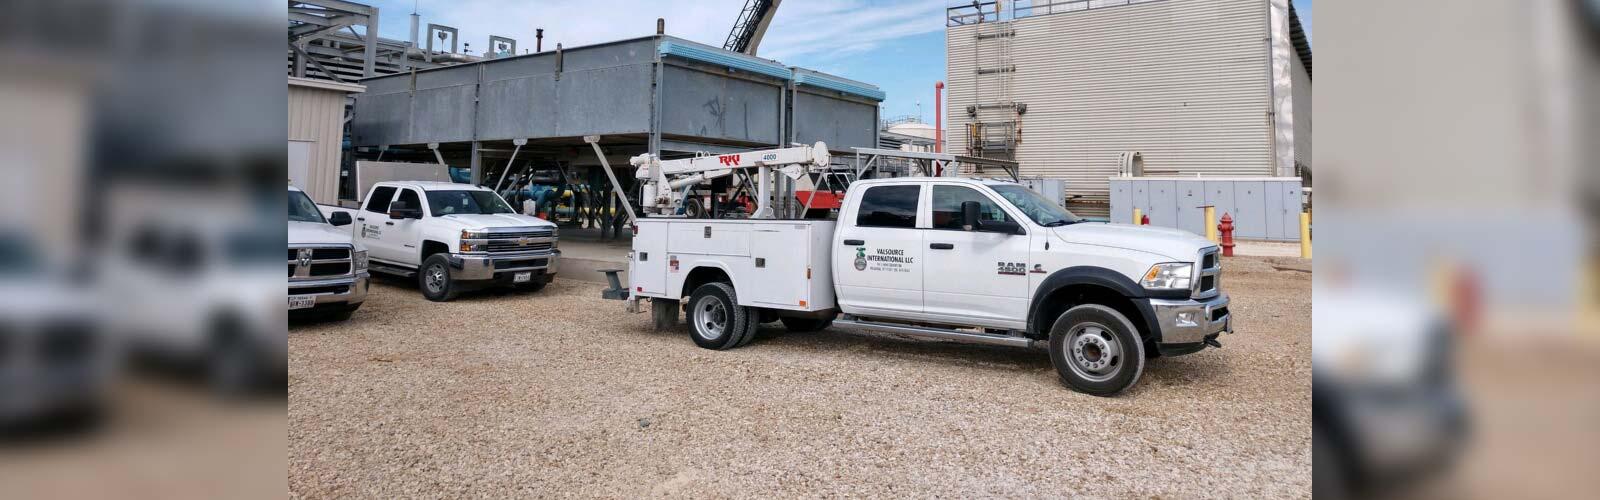 Valsource Service Truck